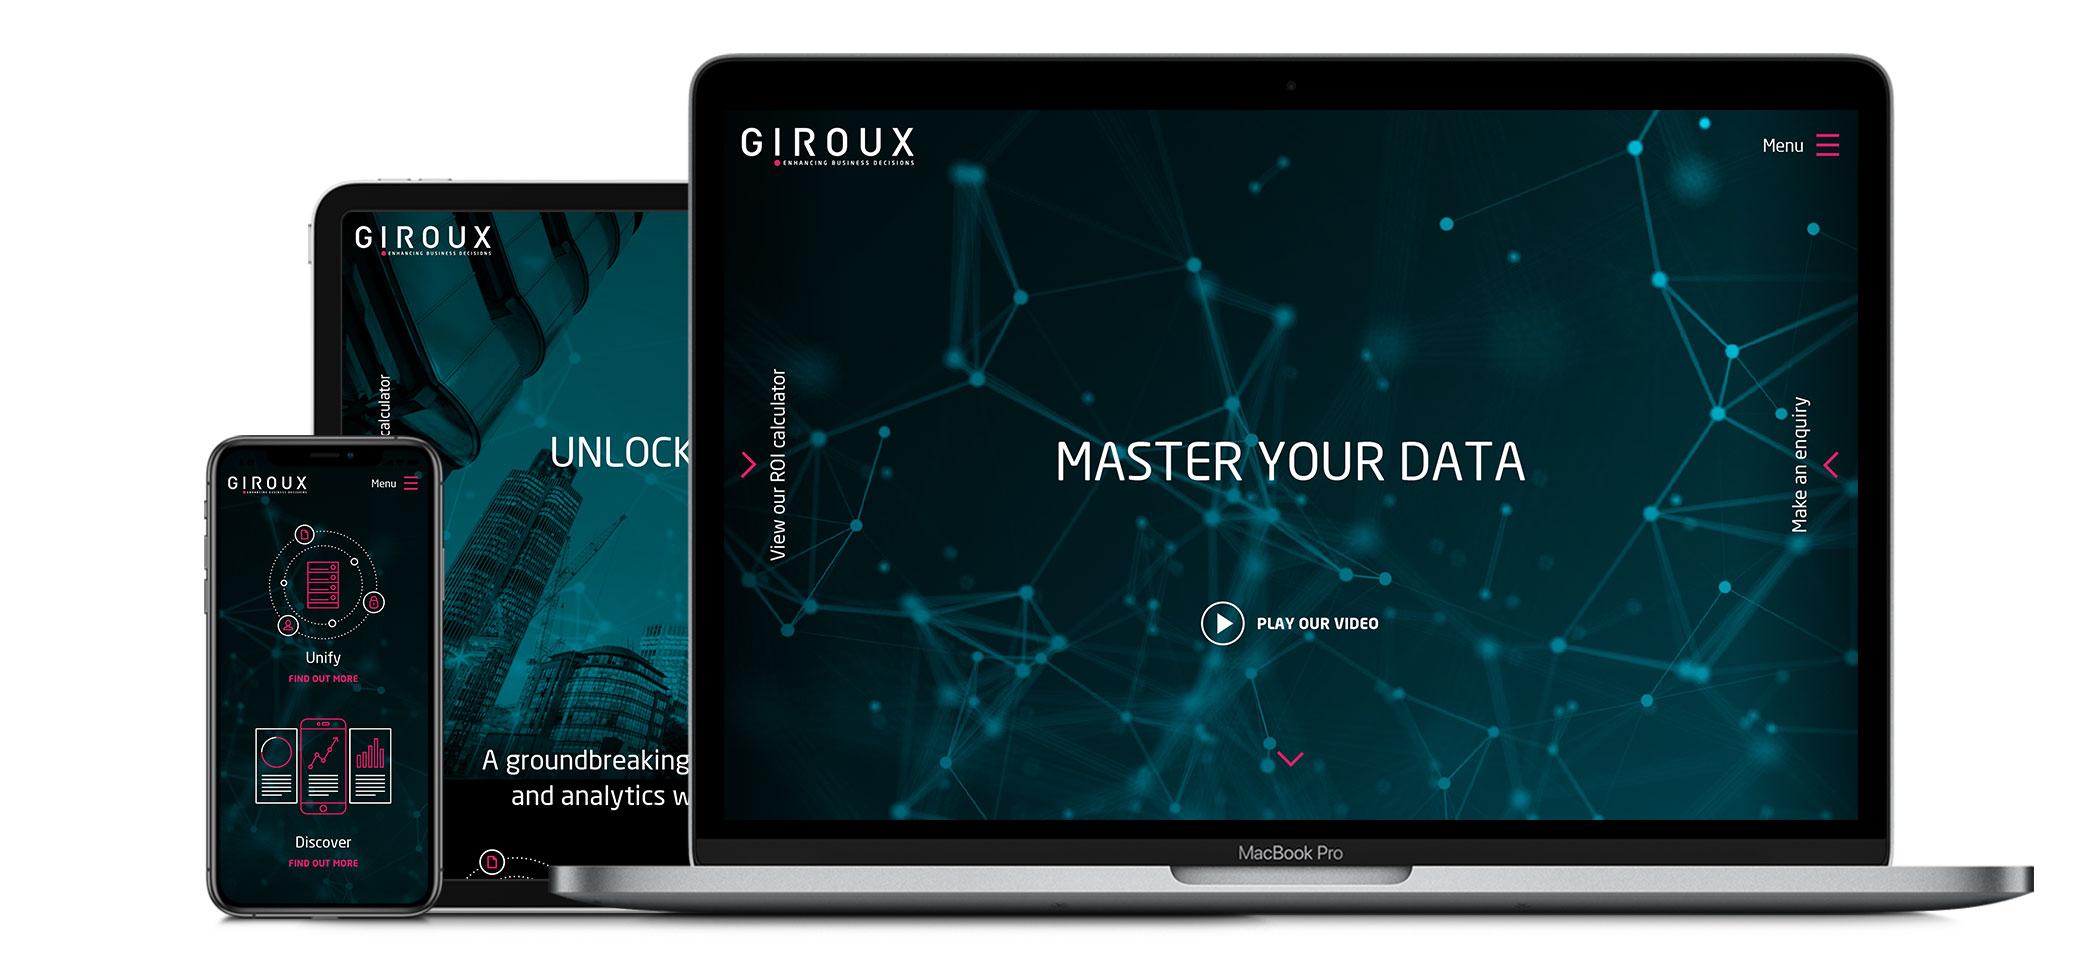 Giroux responsive website design and development